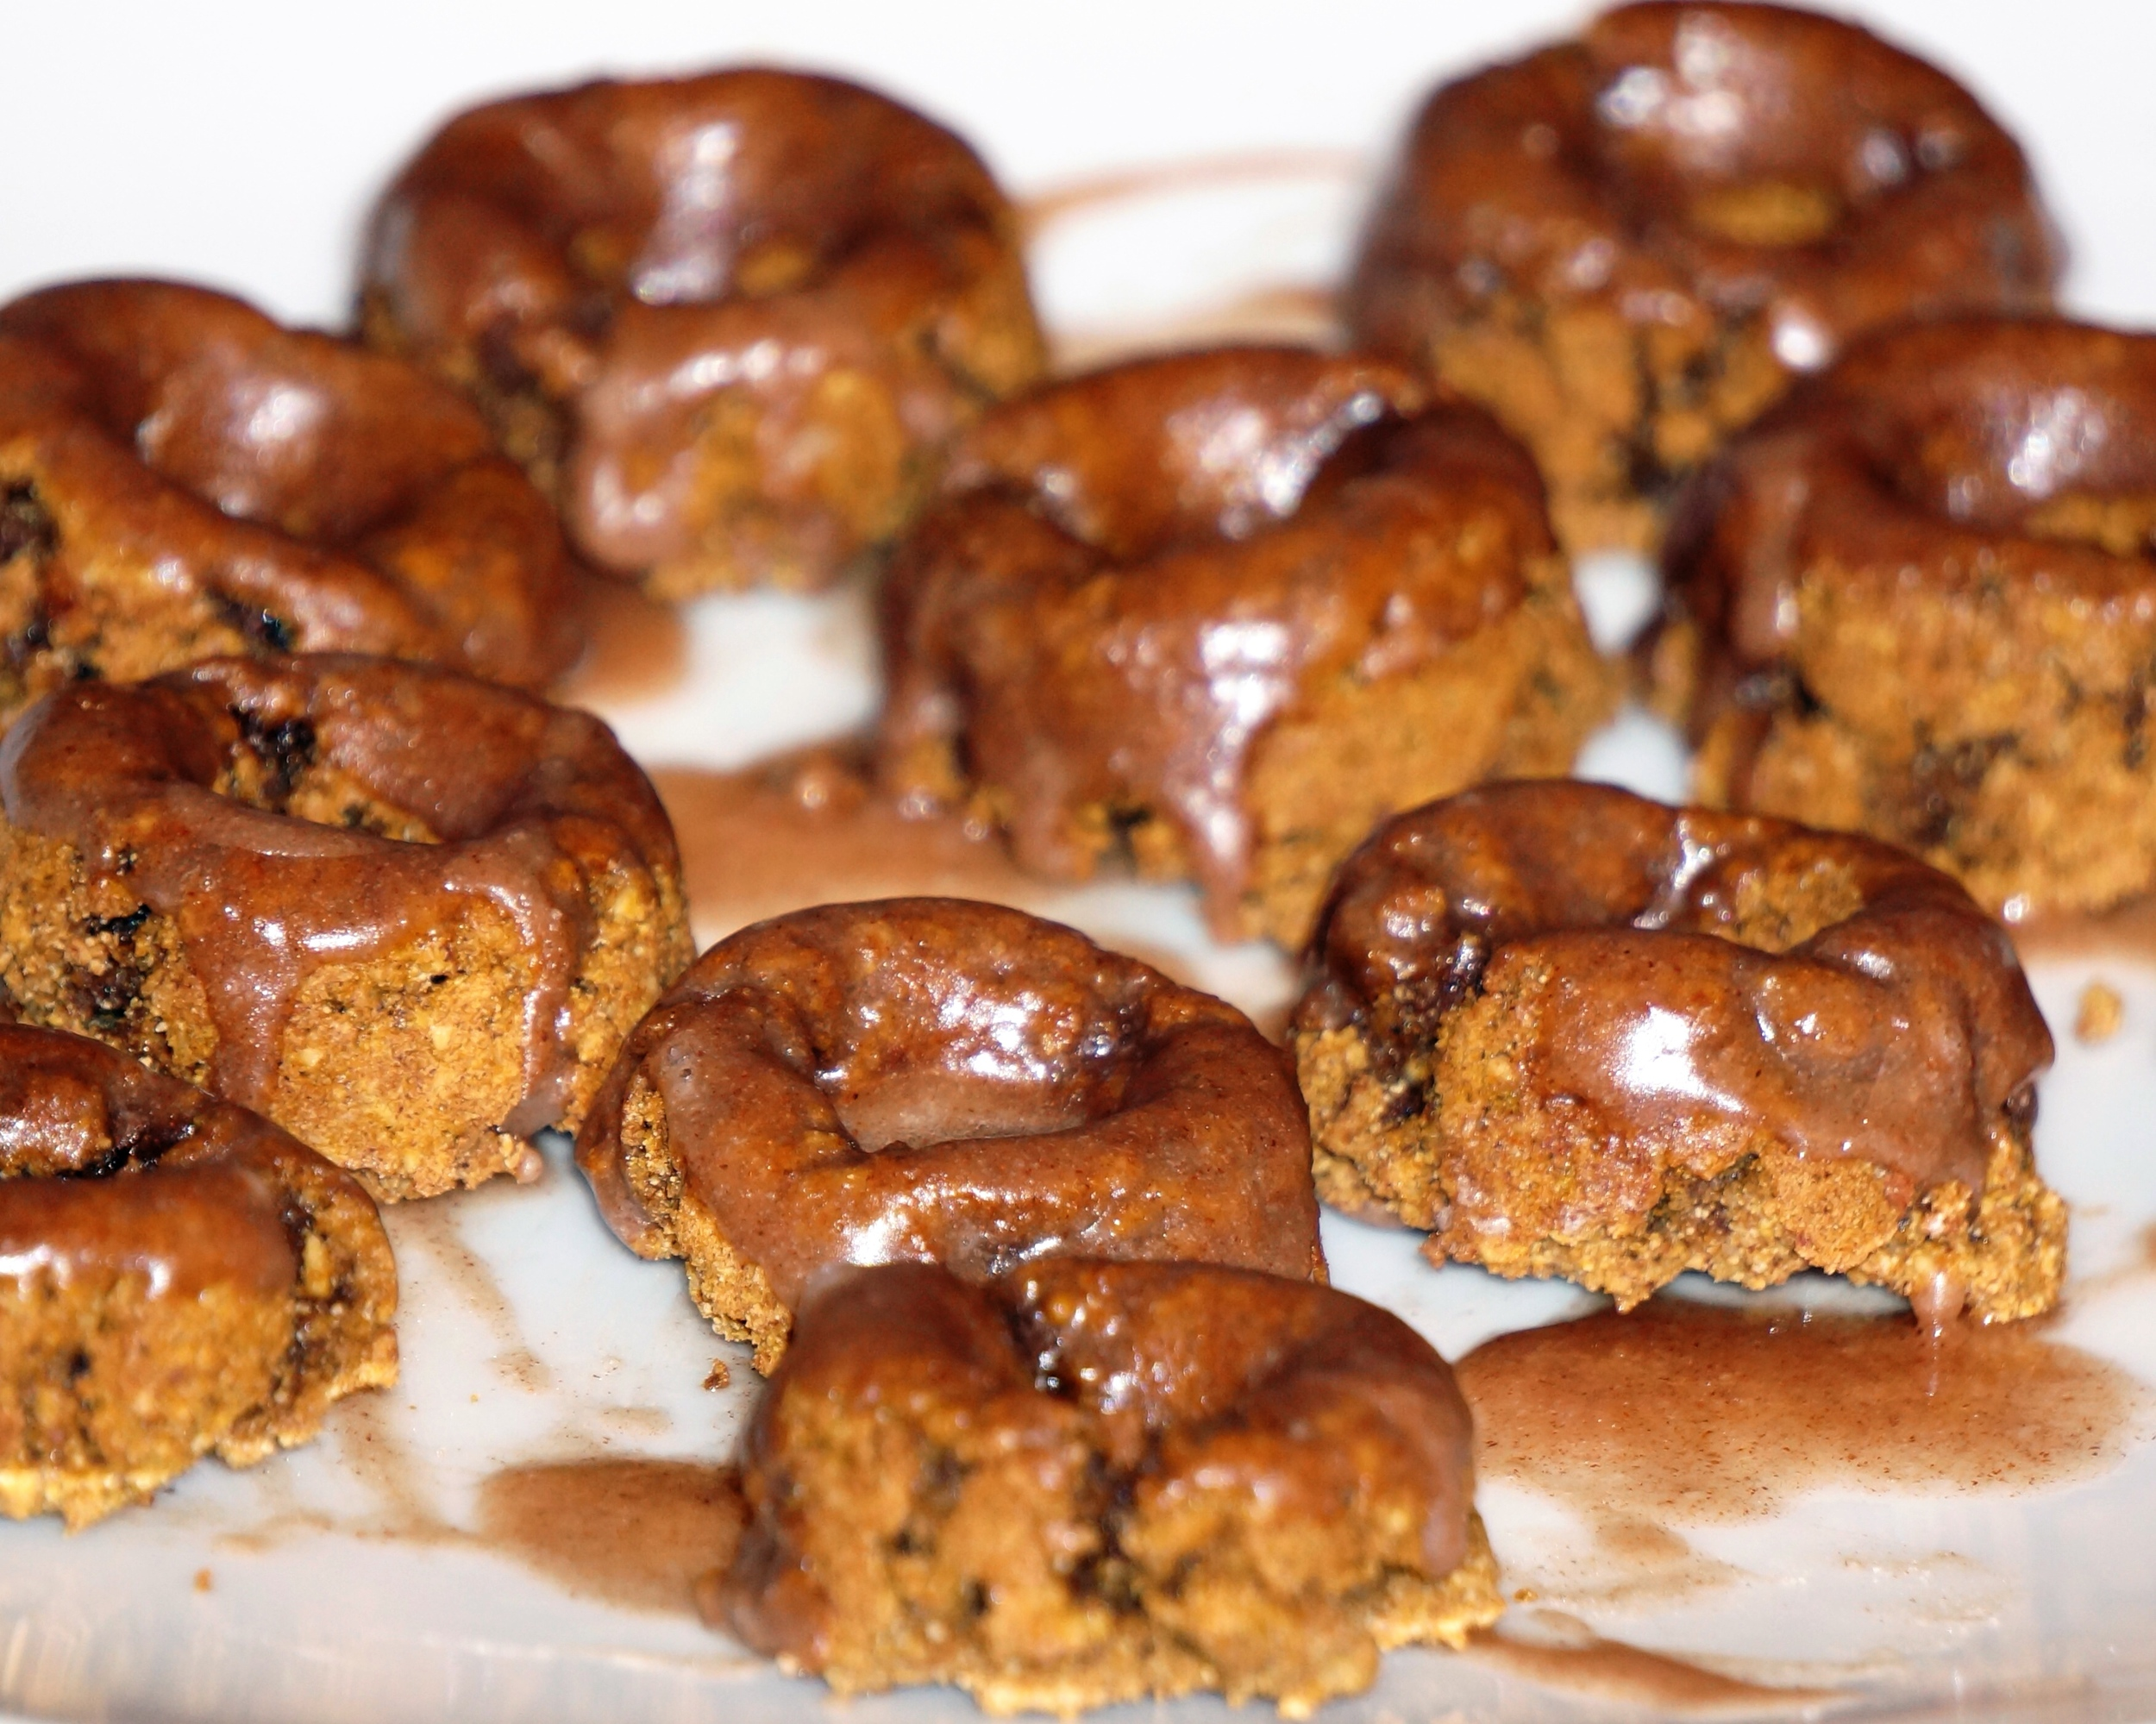 pumpkin spice doughnuts with cinnamon sugar glaze via sarahdigrazia.com (vegan and gluten free)